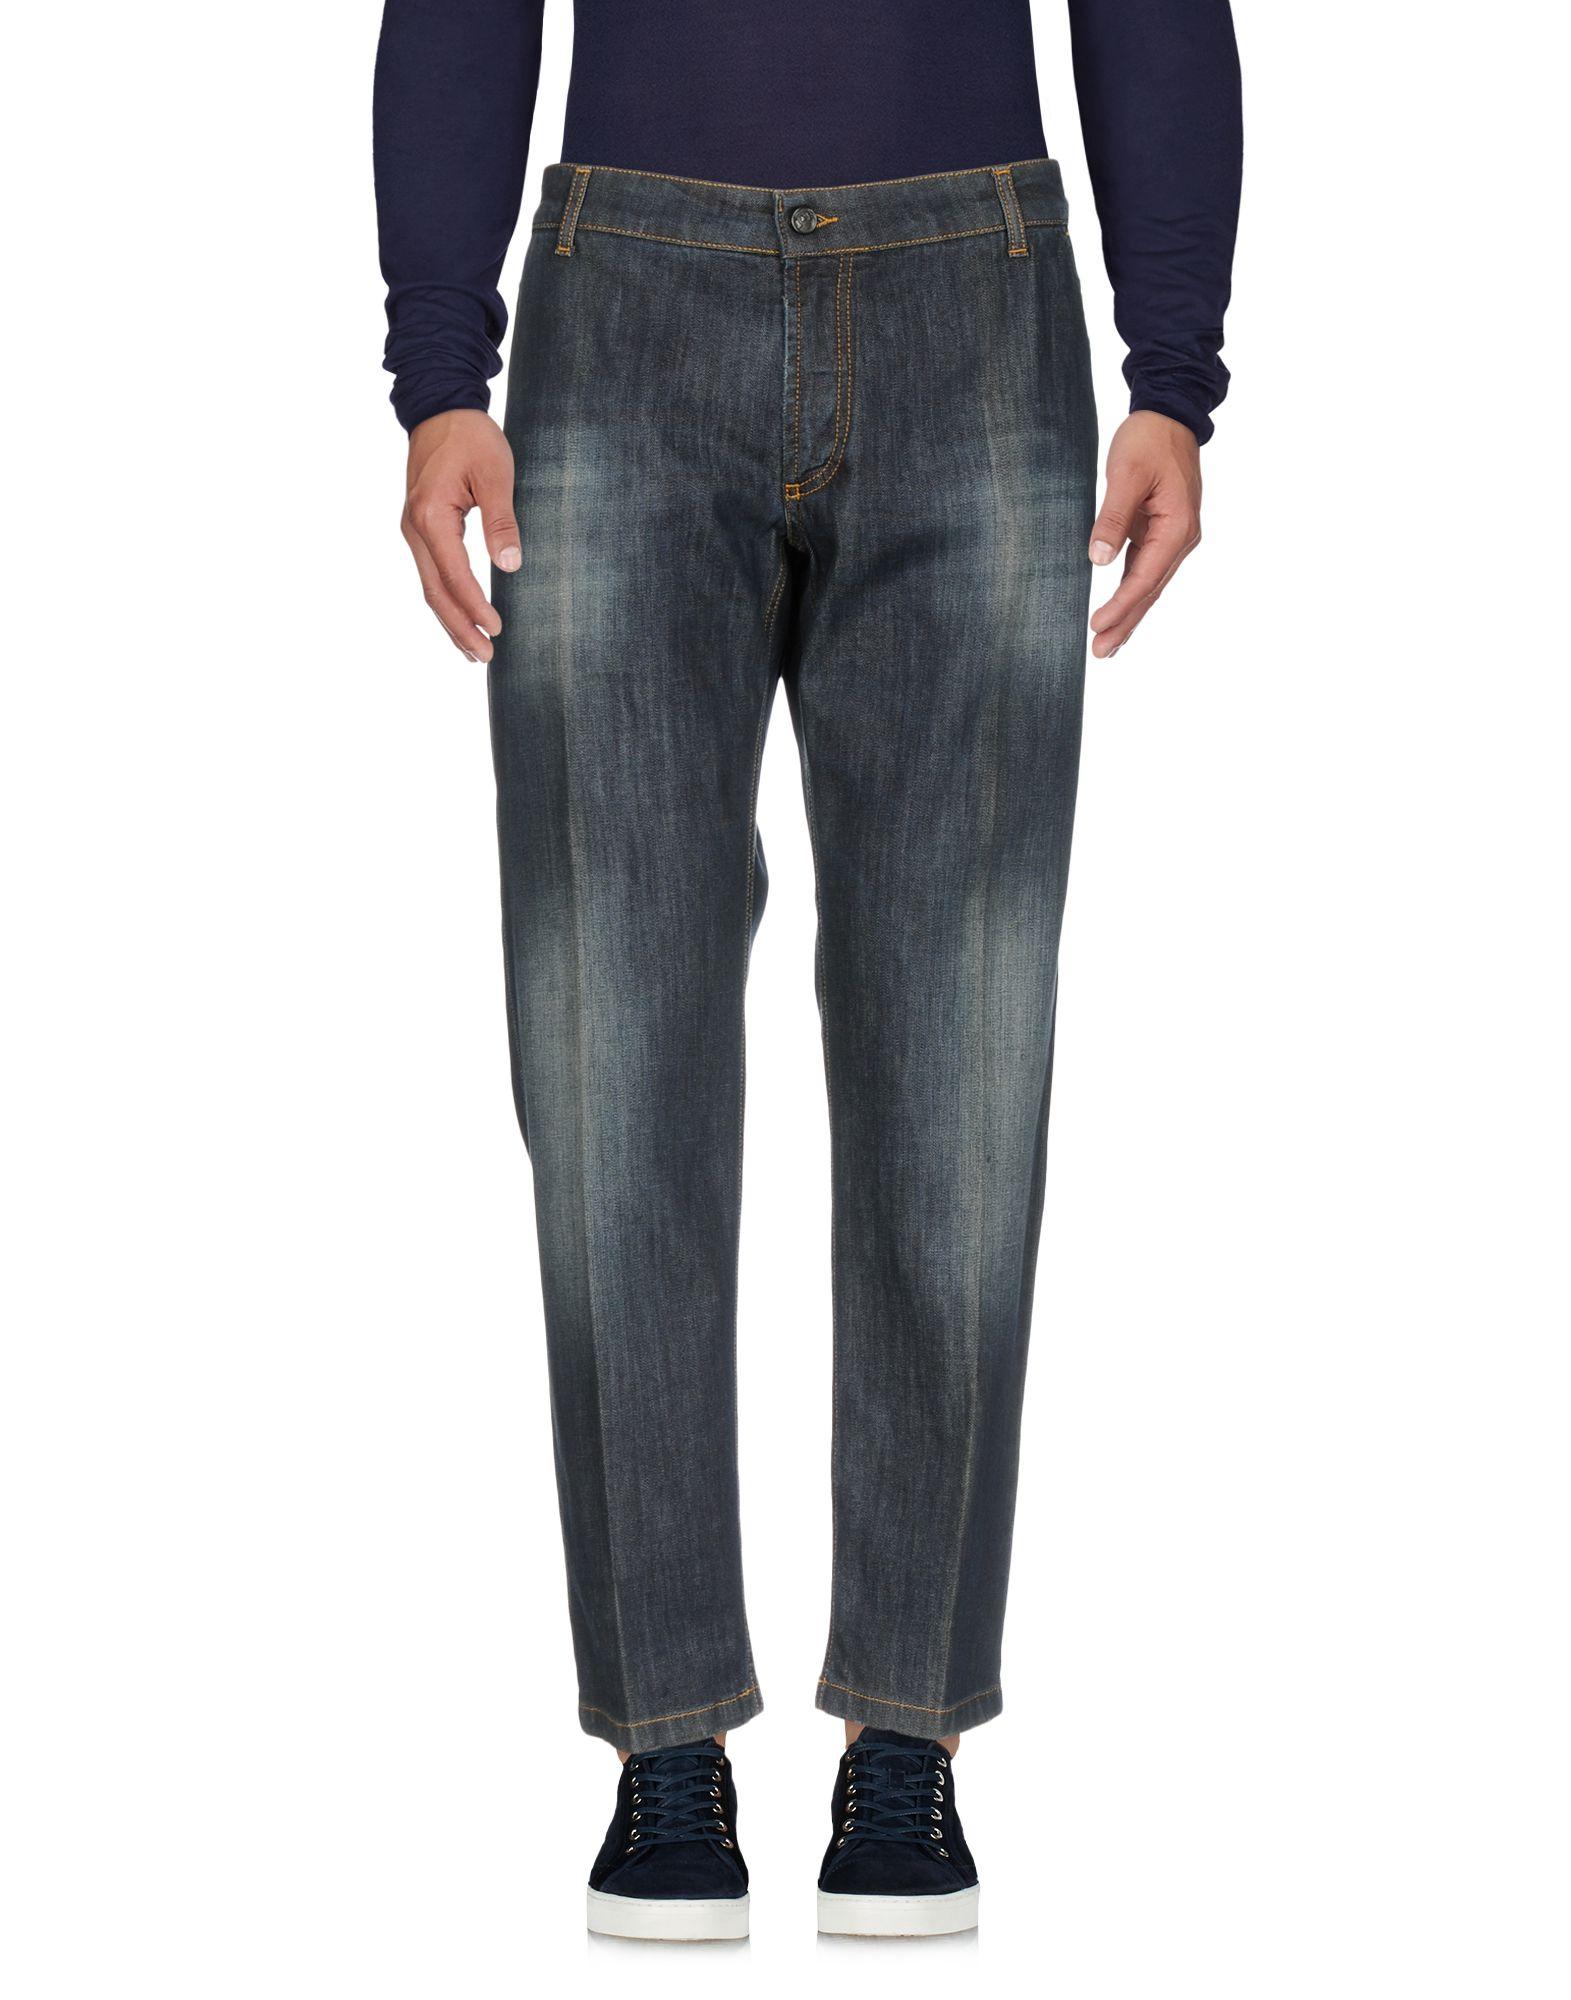 Pantaloni Jeans Entre Amis Donna - Acquista online su